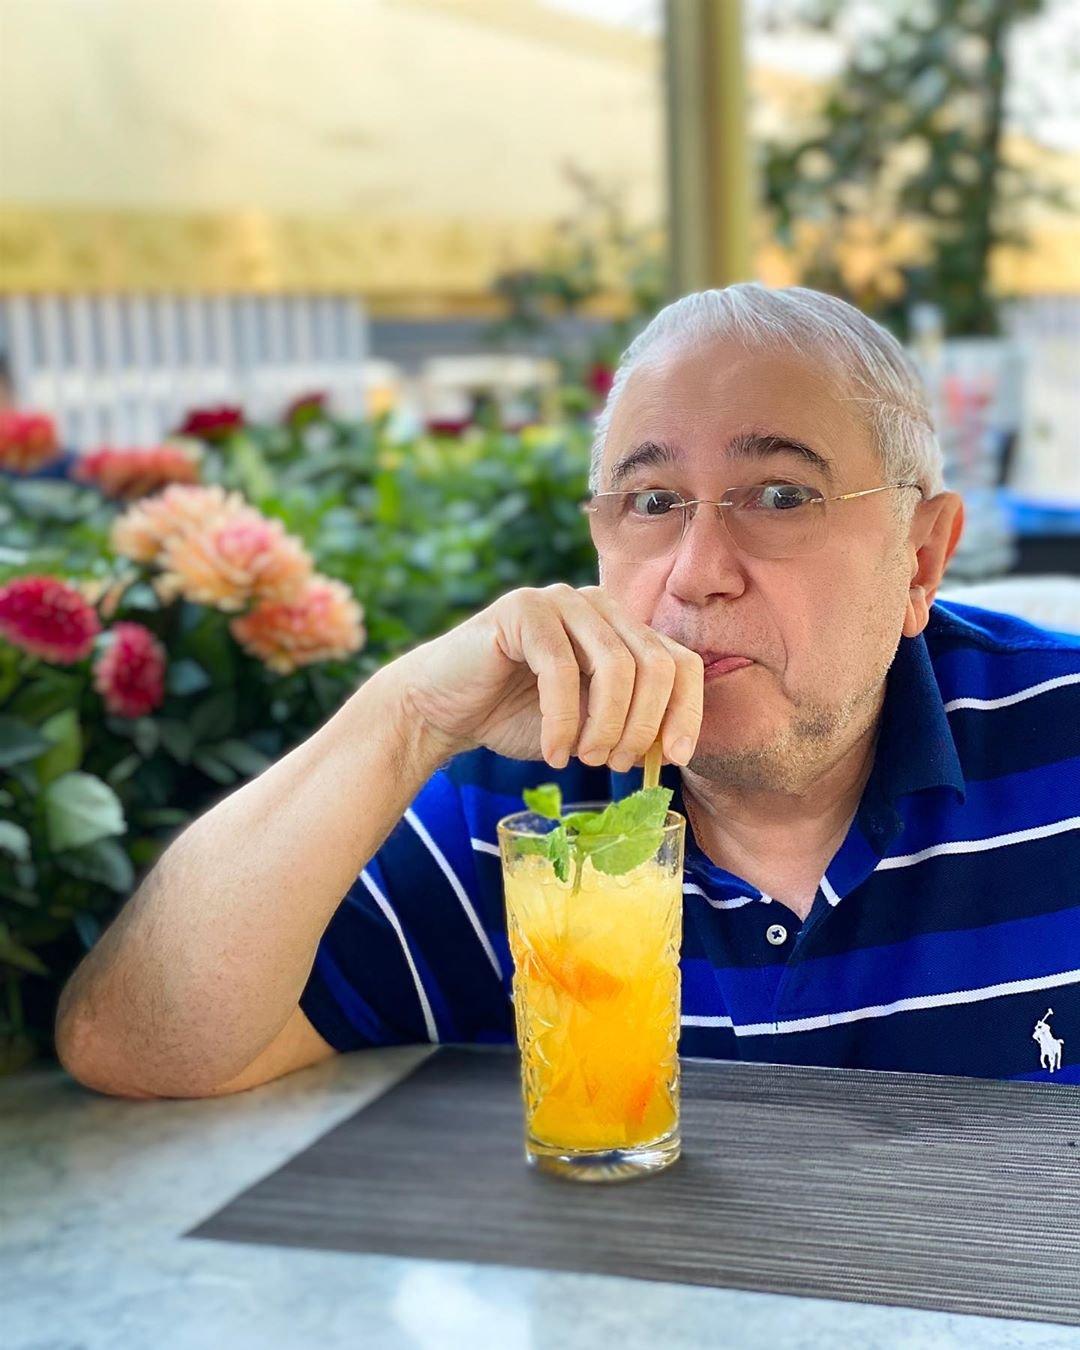 Сходив на растяжку, Евгений Петросян пригласил Татьяну Брухунову в ресторан